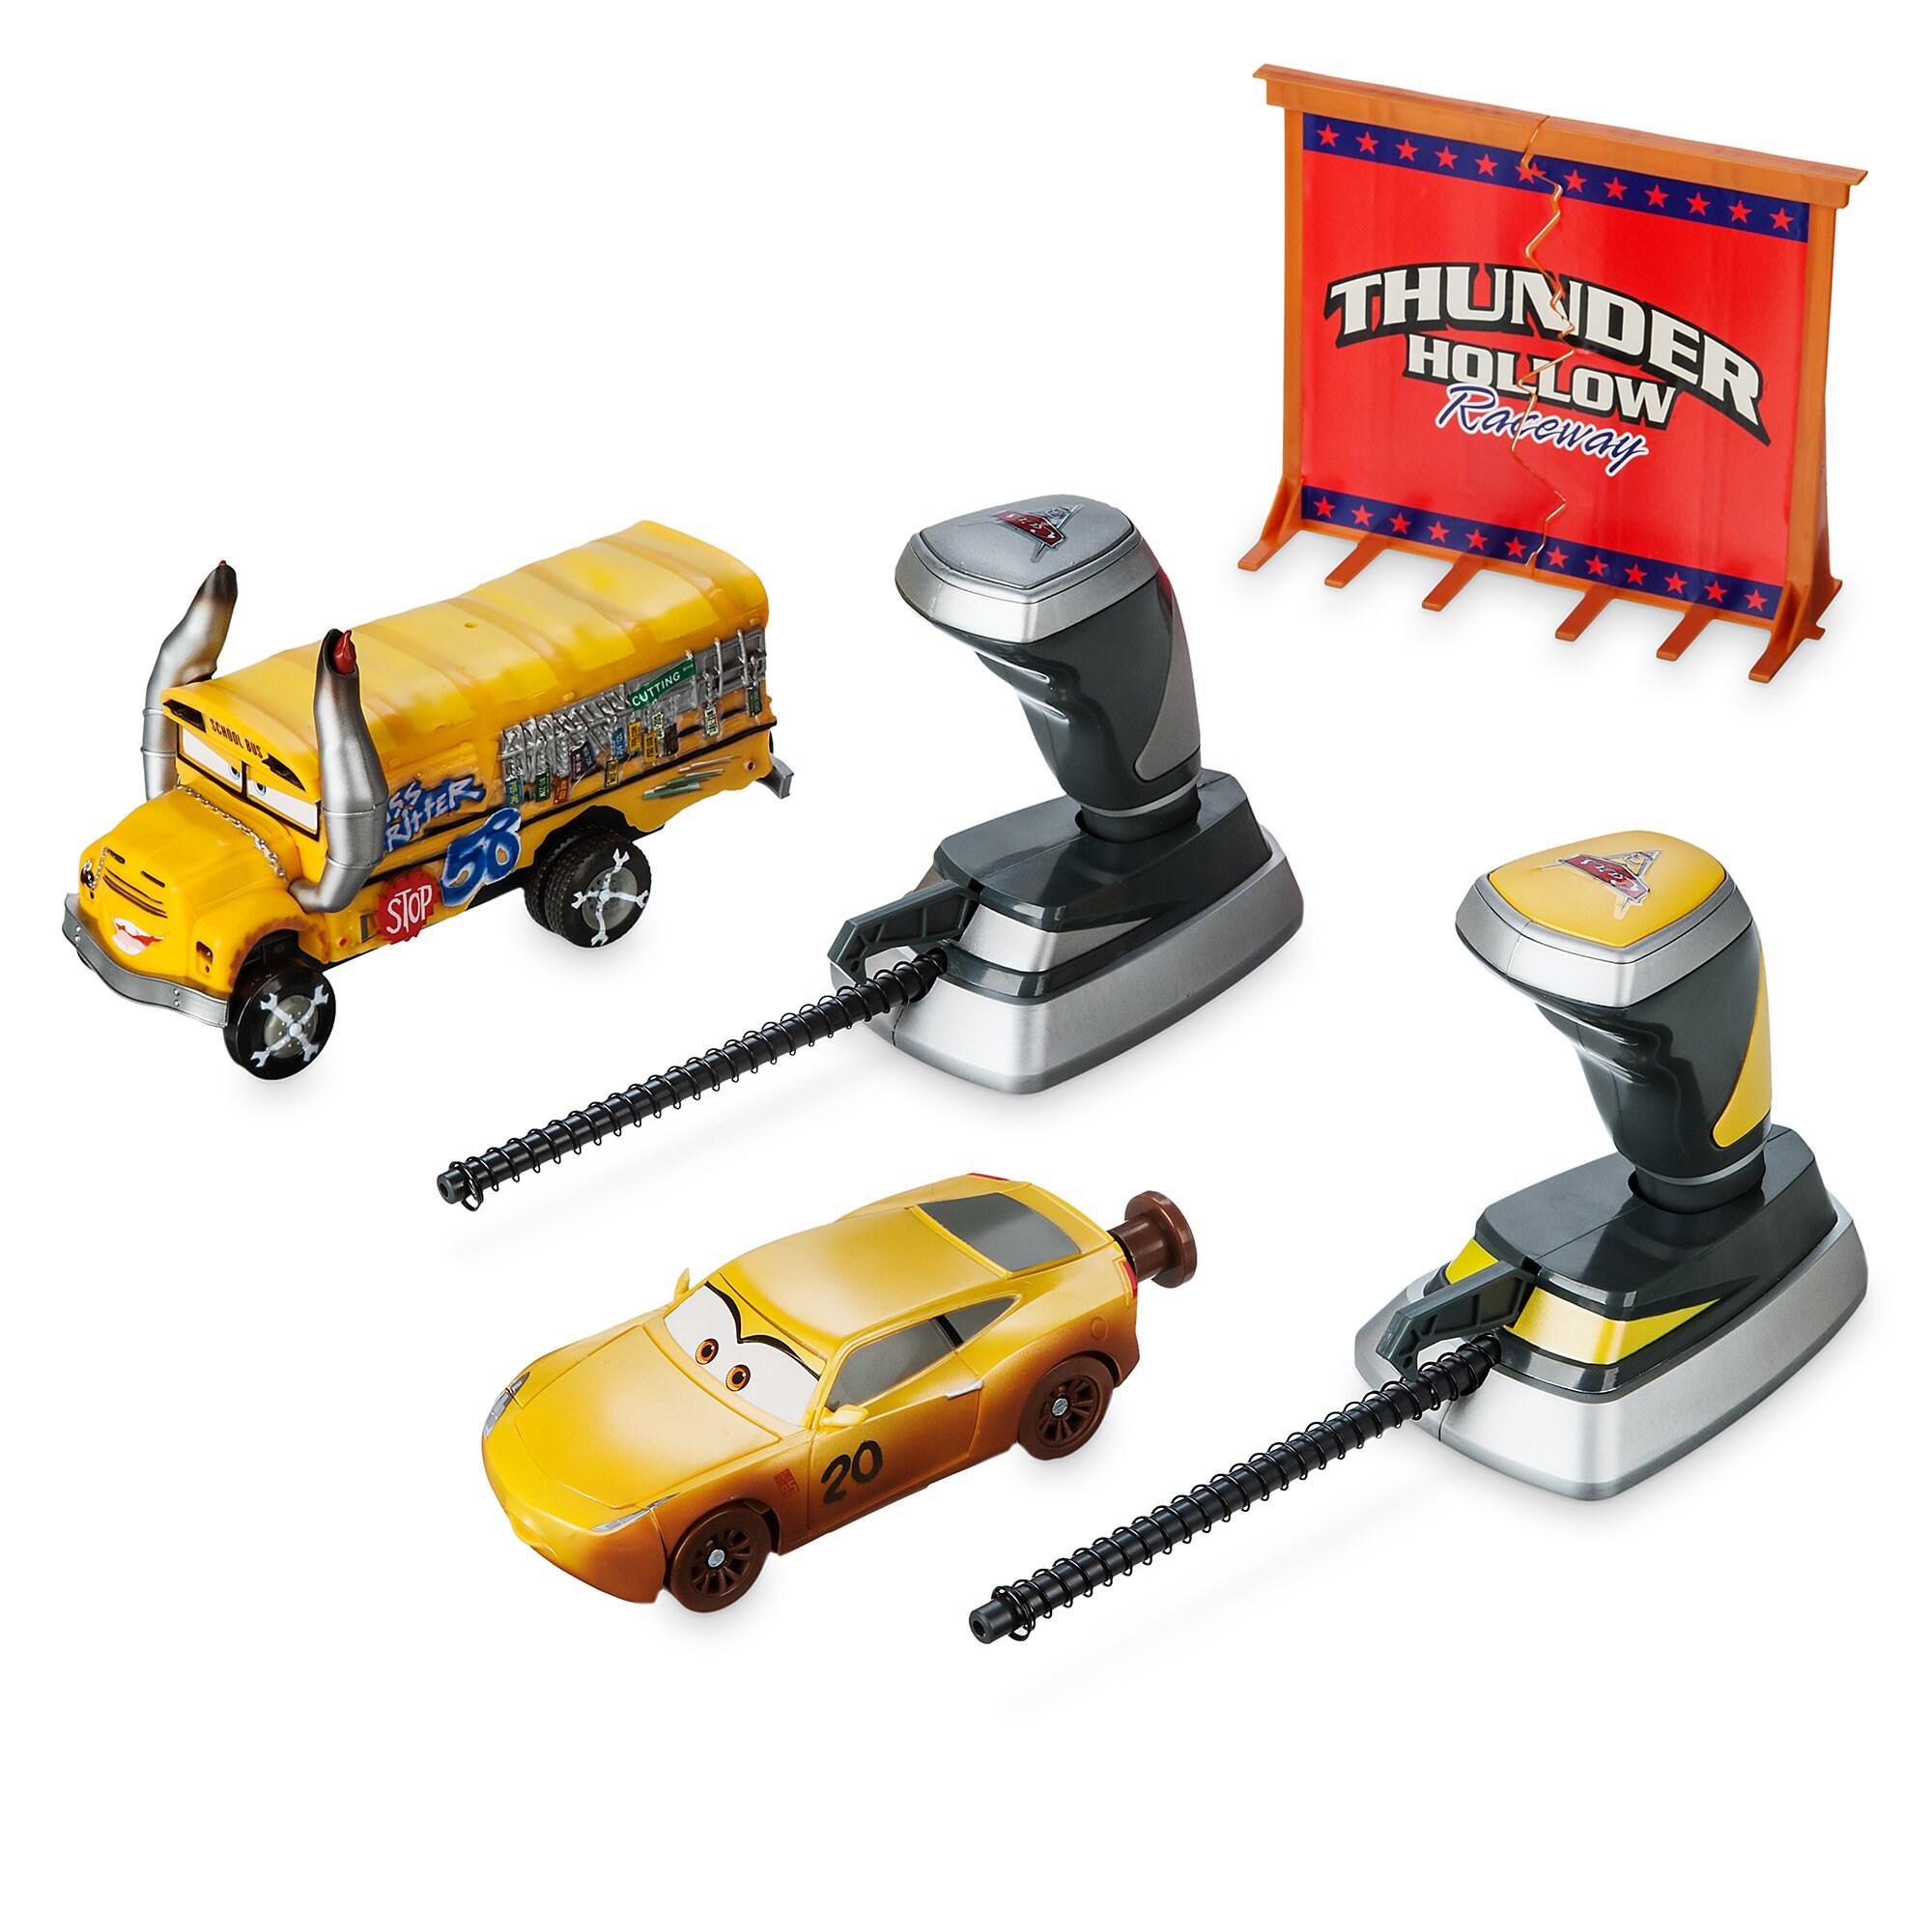 Thunder Hollow Crazy 8's Demolition 2-Car Crash Set - Cars 3